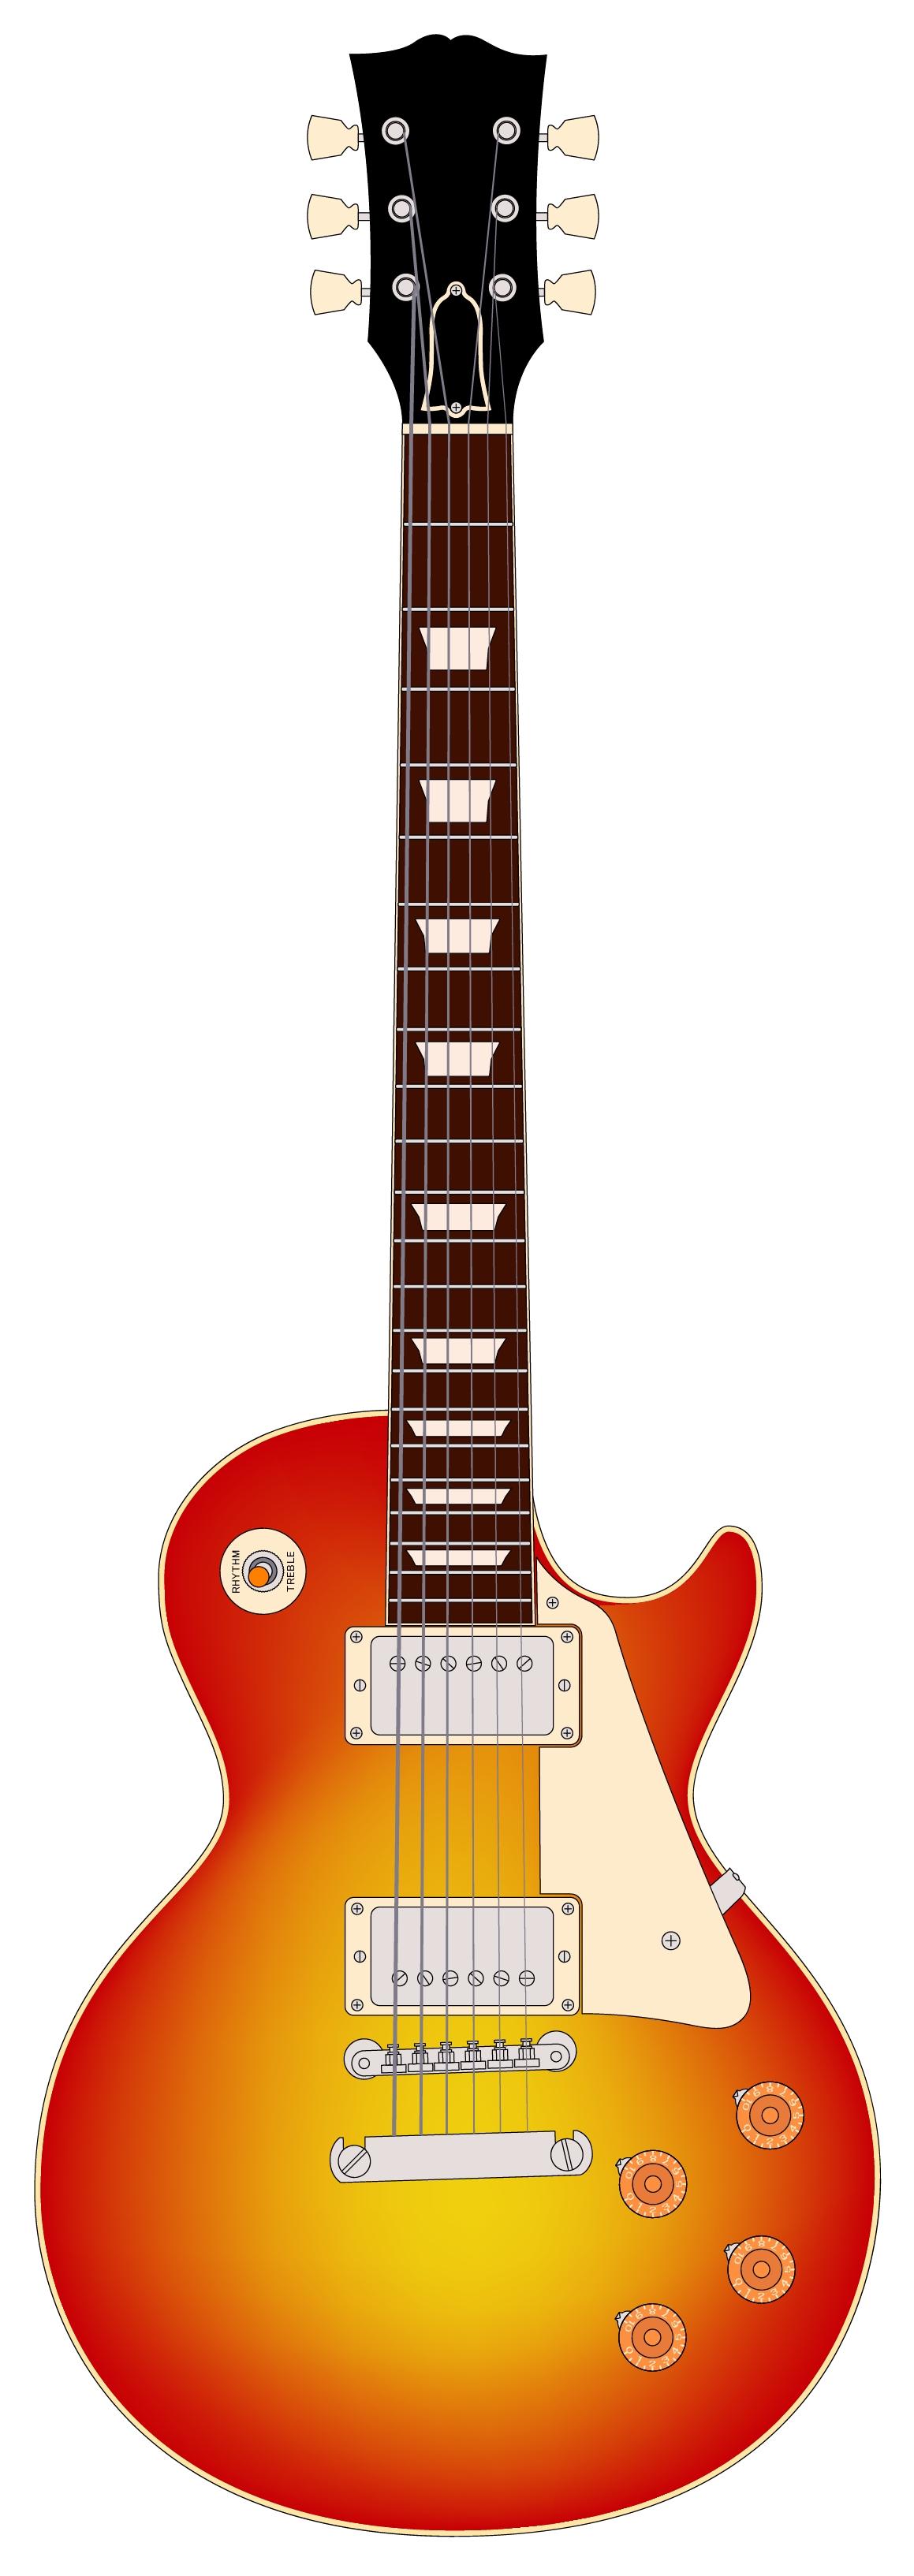 Purple Guitar Clipart